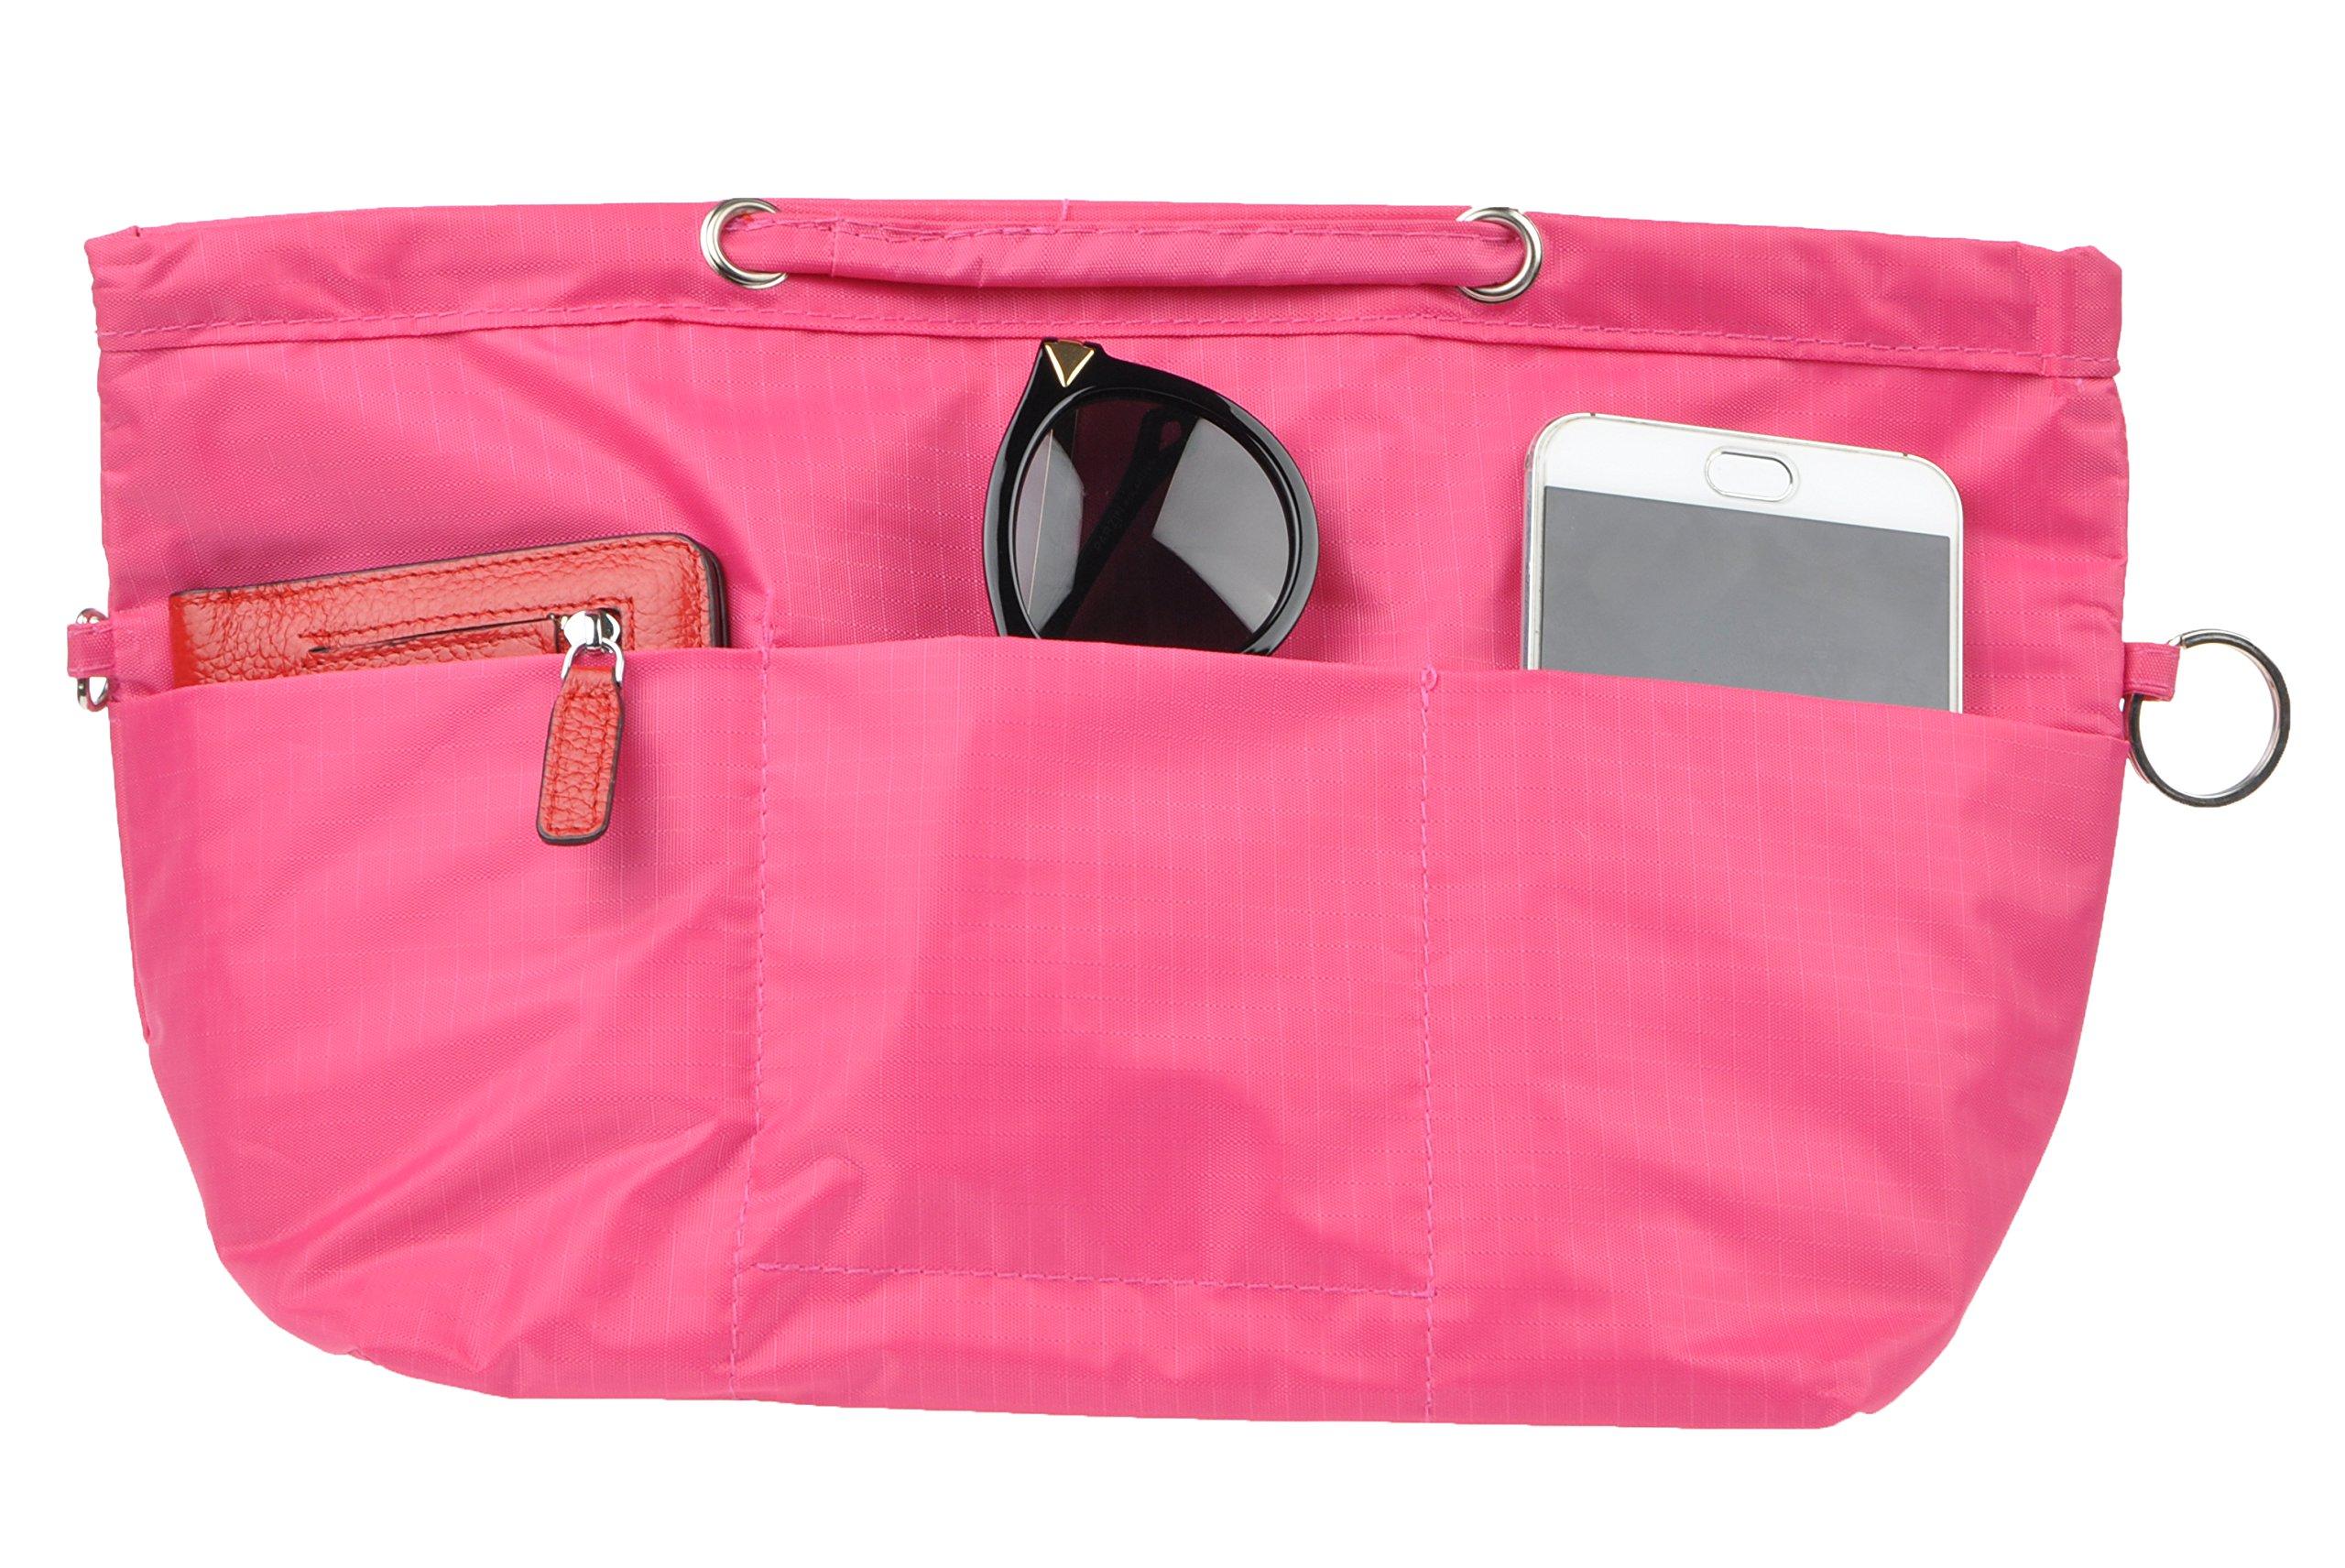 Vercord Oxford Handbag Purse Tote Pocketbook Insert Organizer With Handle 2 Sizes, Rose M